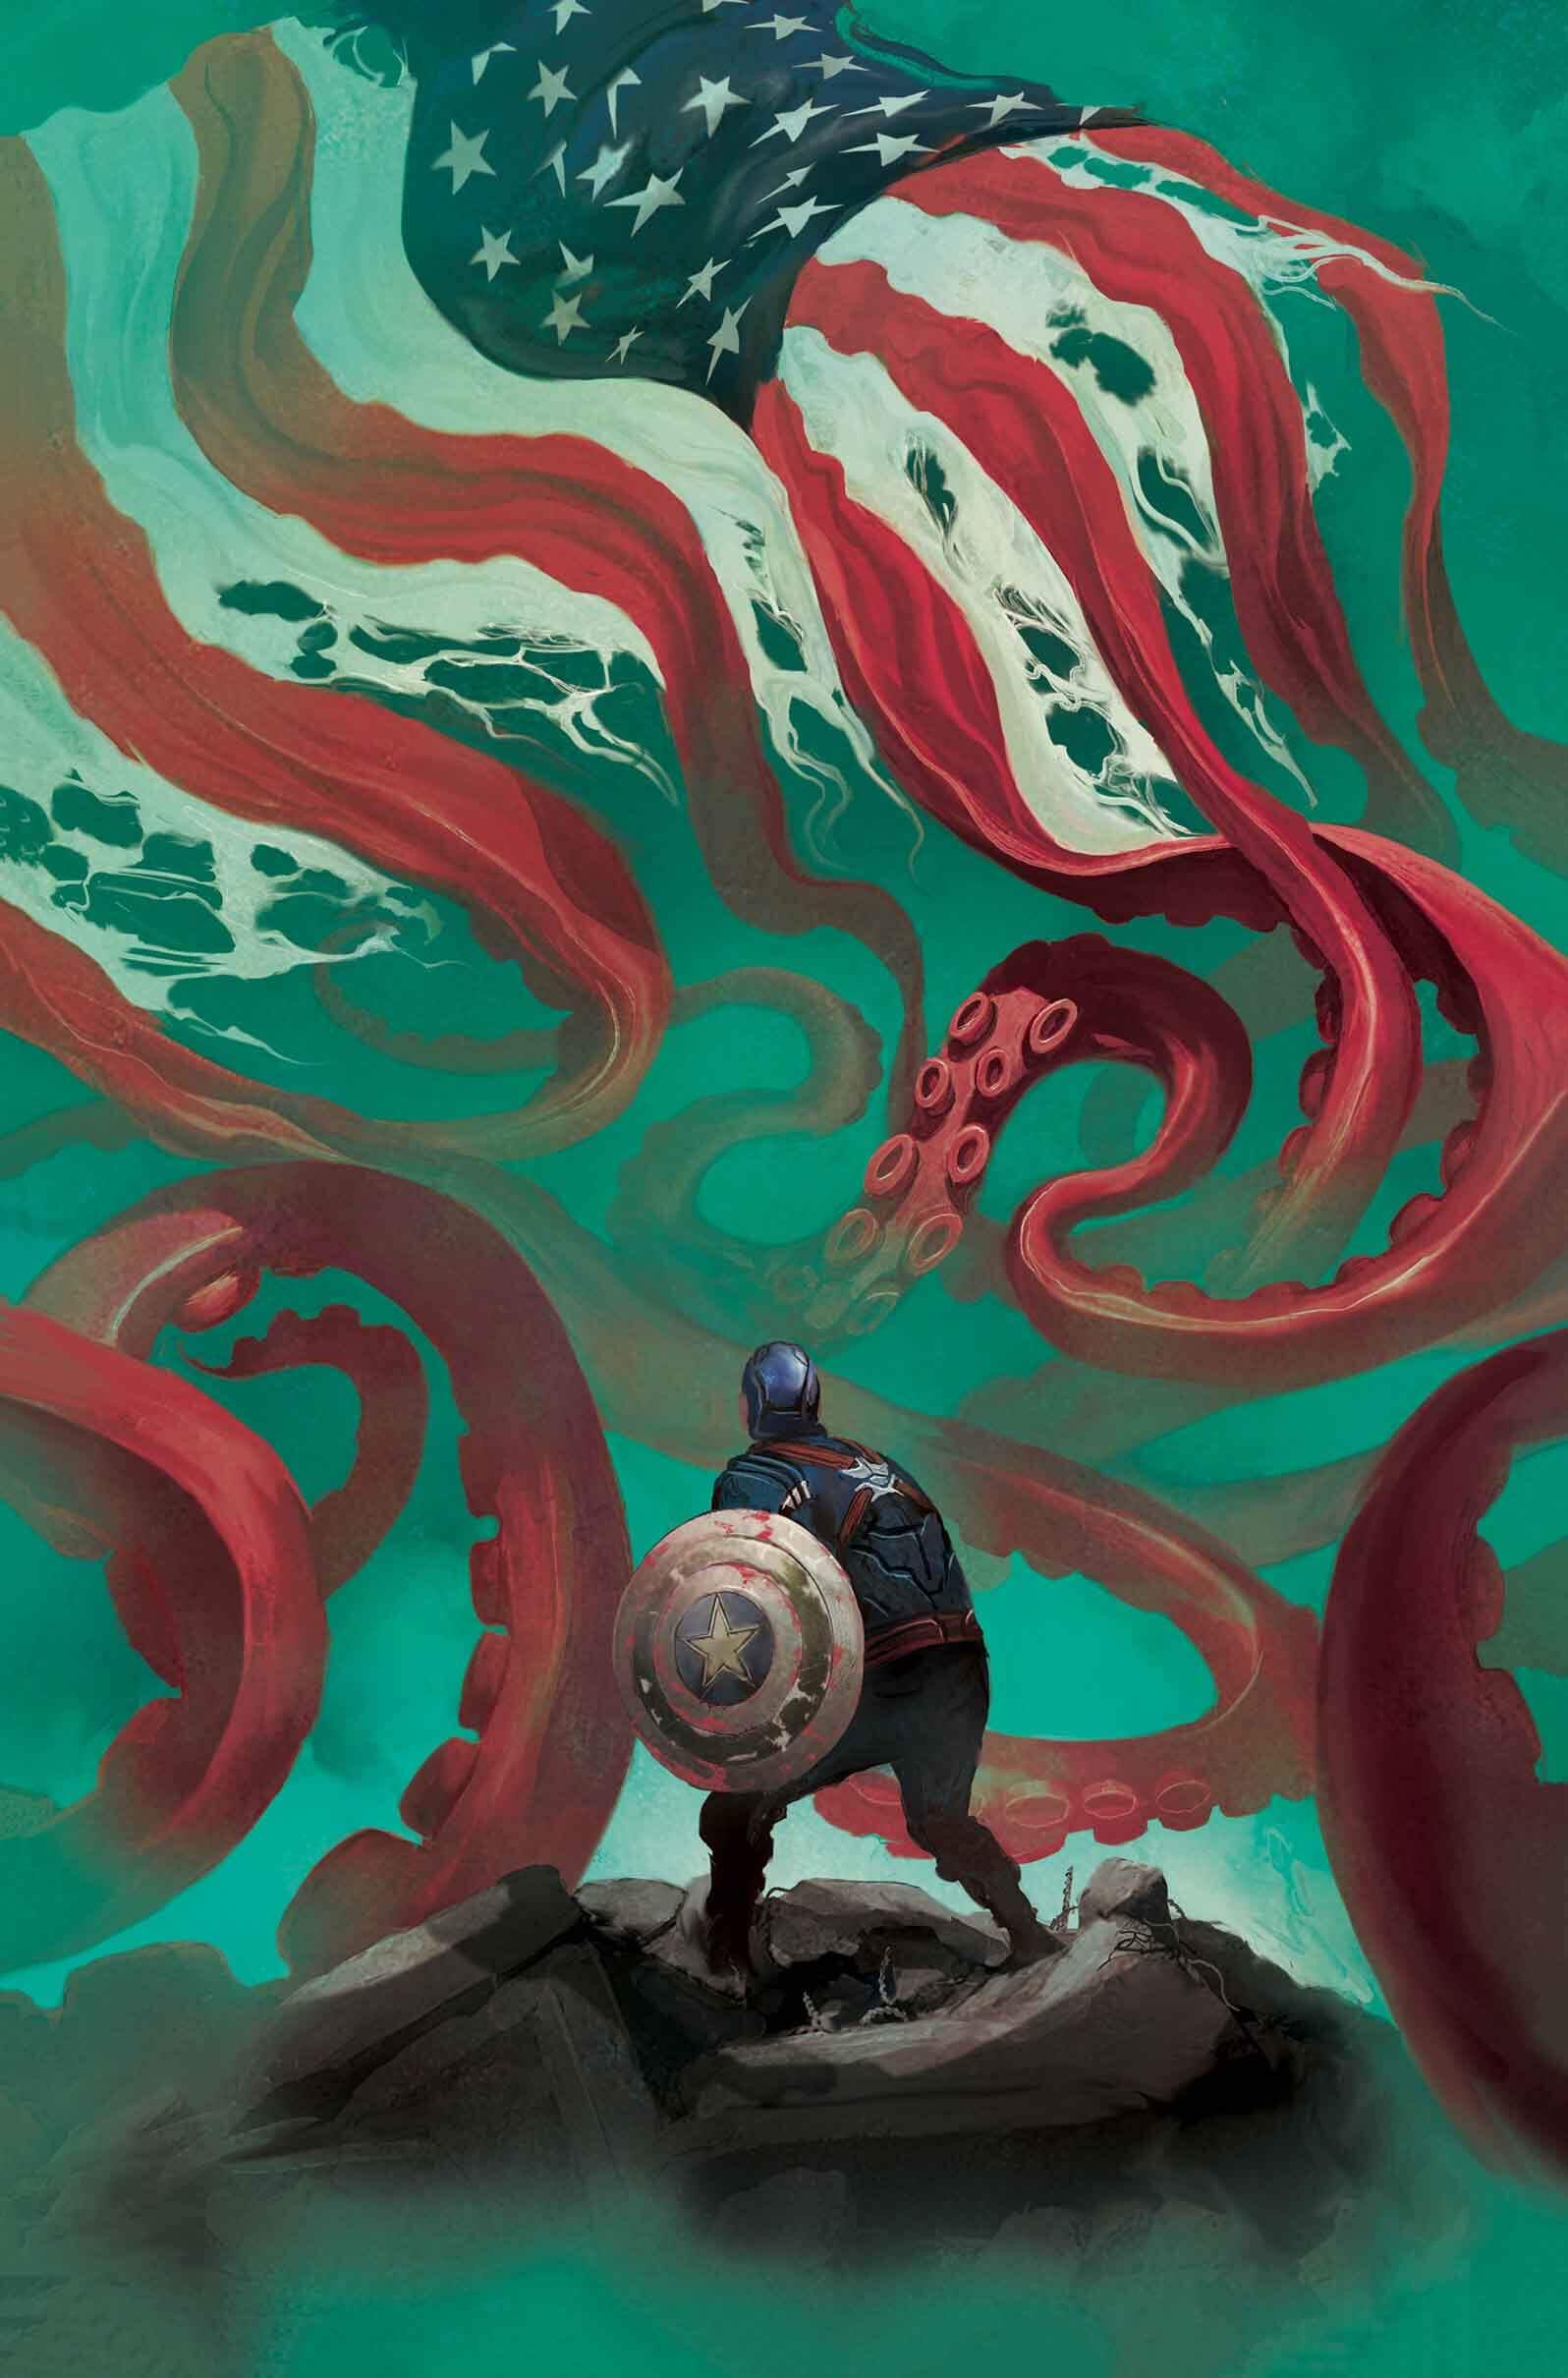 Mike Del Mundo comic book wallpapers 3 (1)